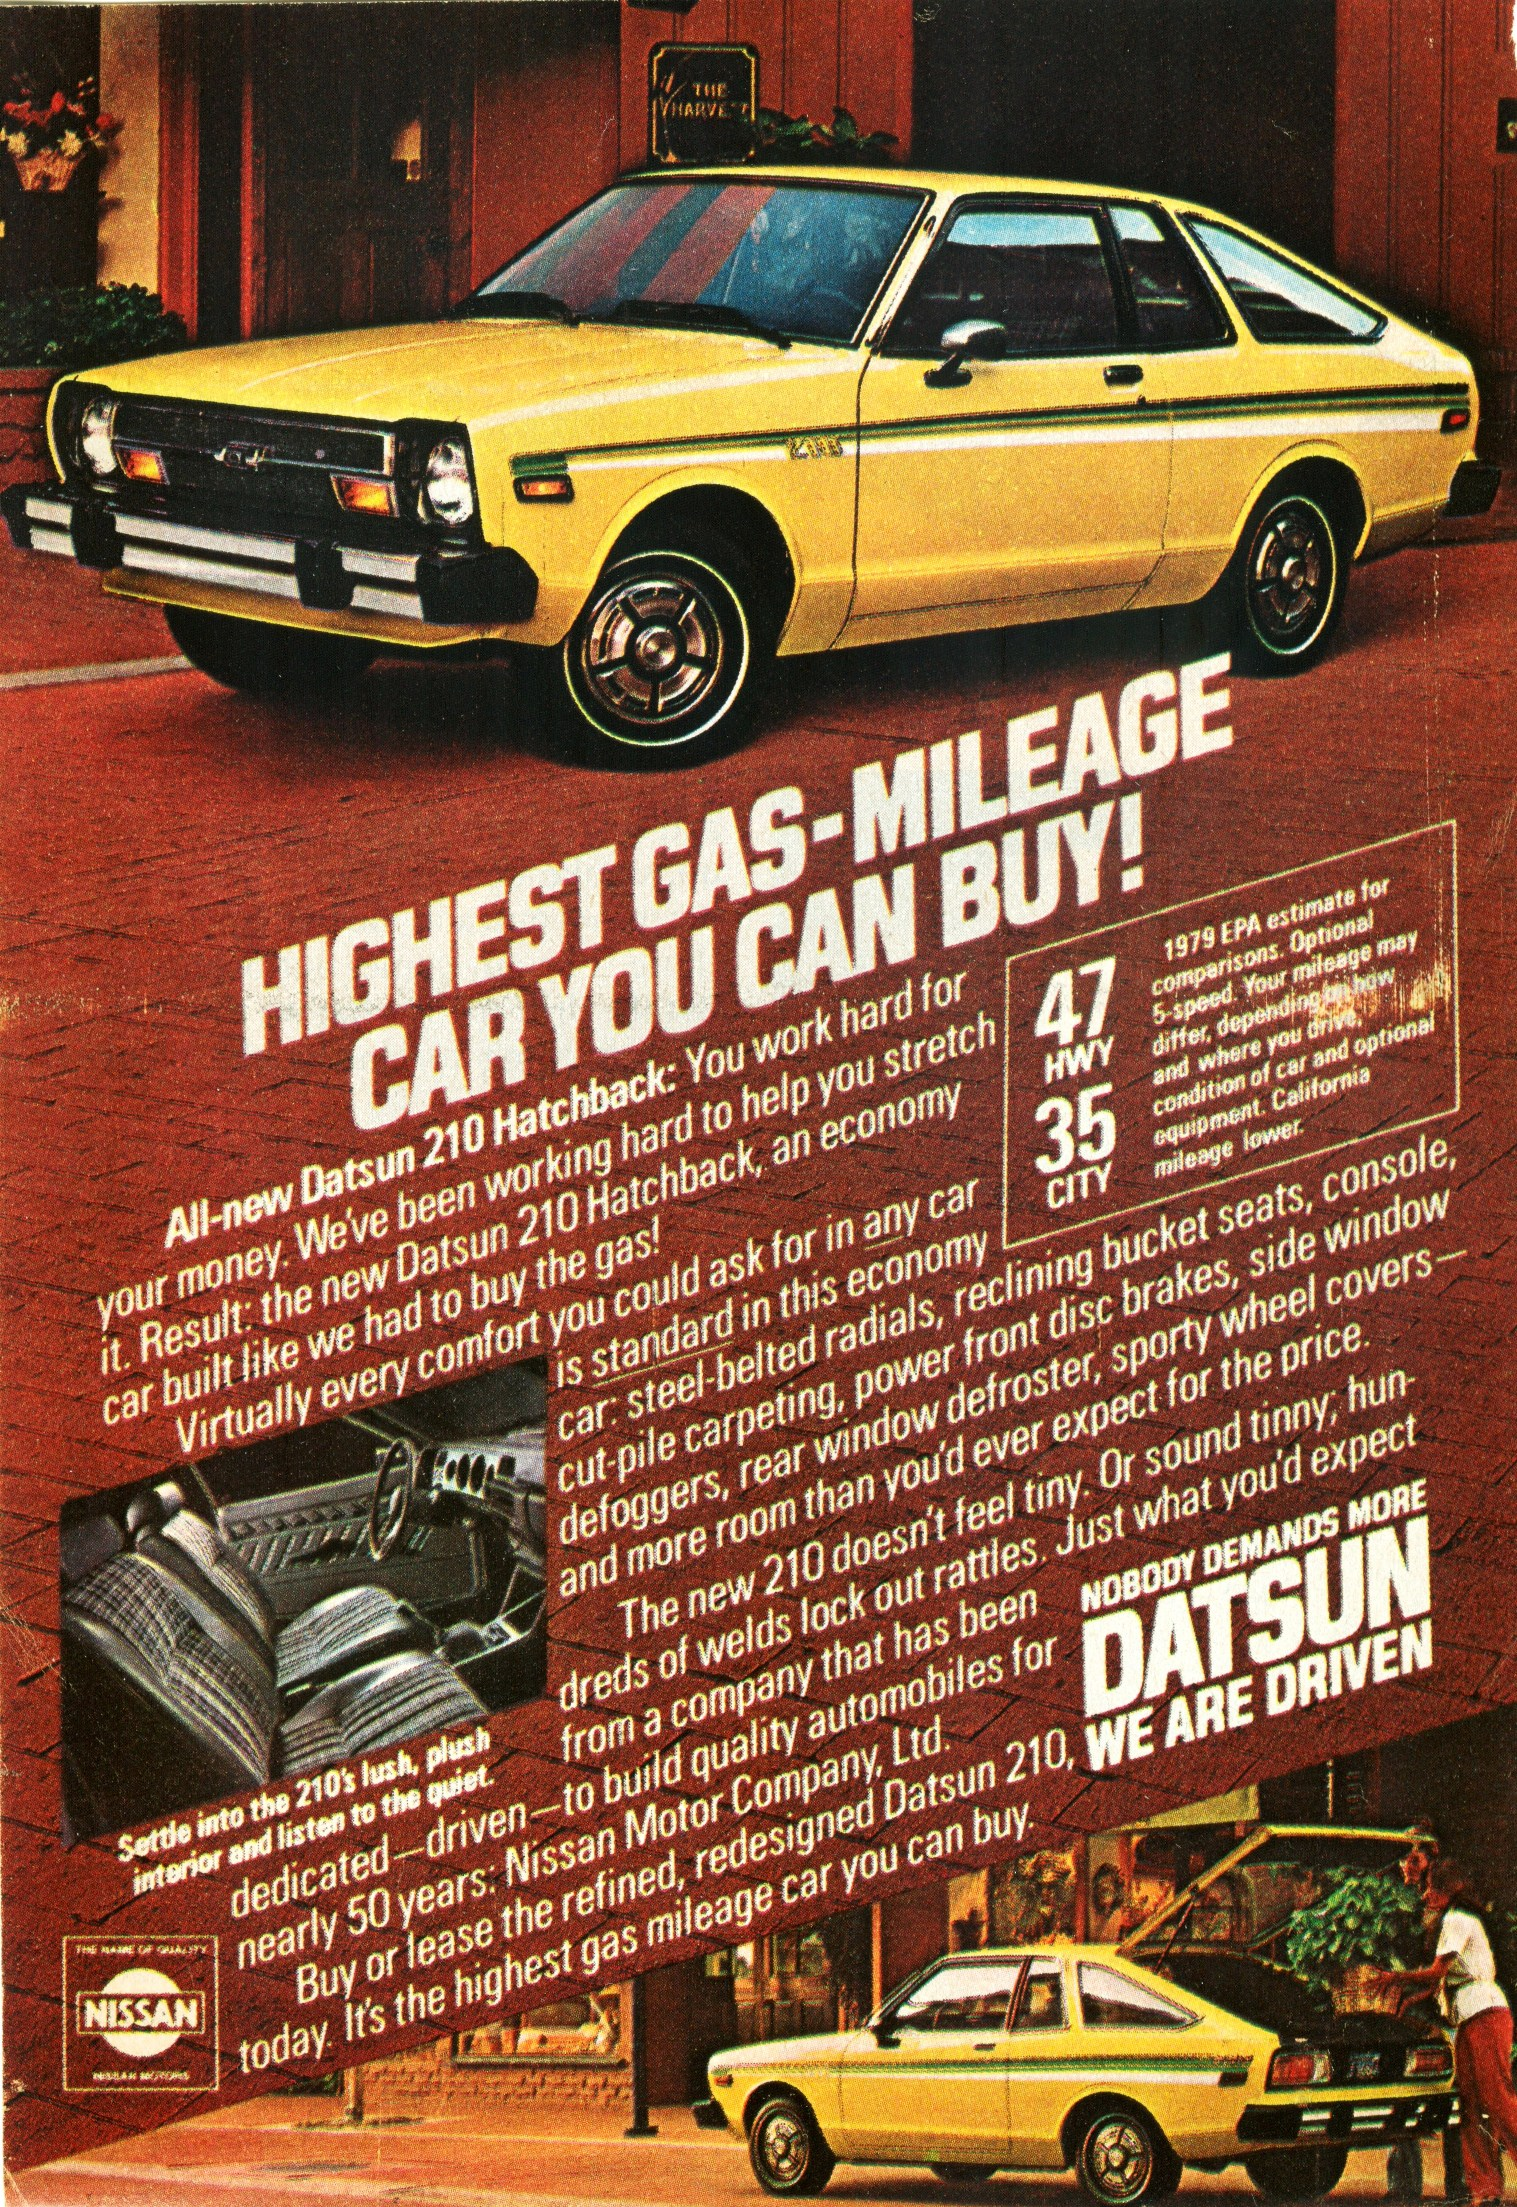 1979-Datsun-210-Hatchback.jpg